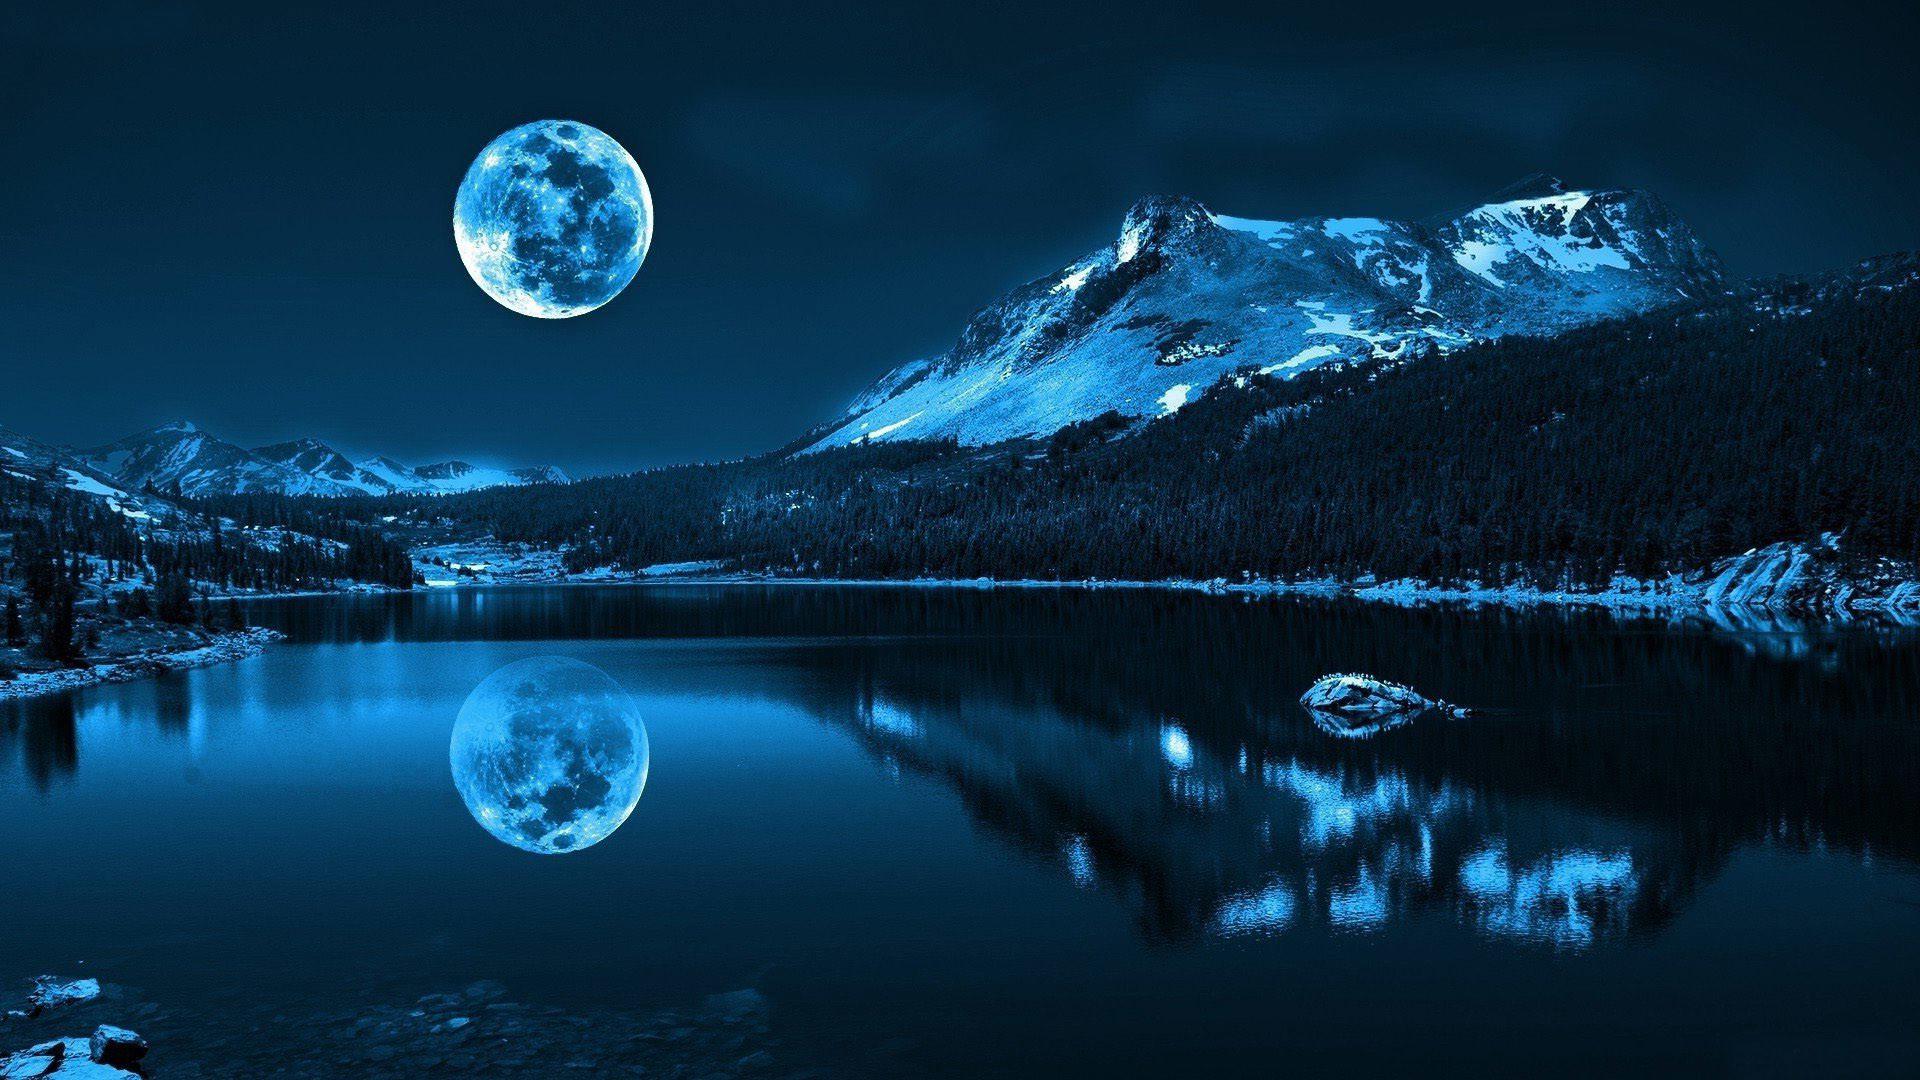 Beautiful Night Moon Mountain and Lake Shadow HD Wallpaper